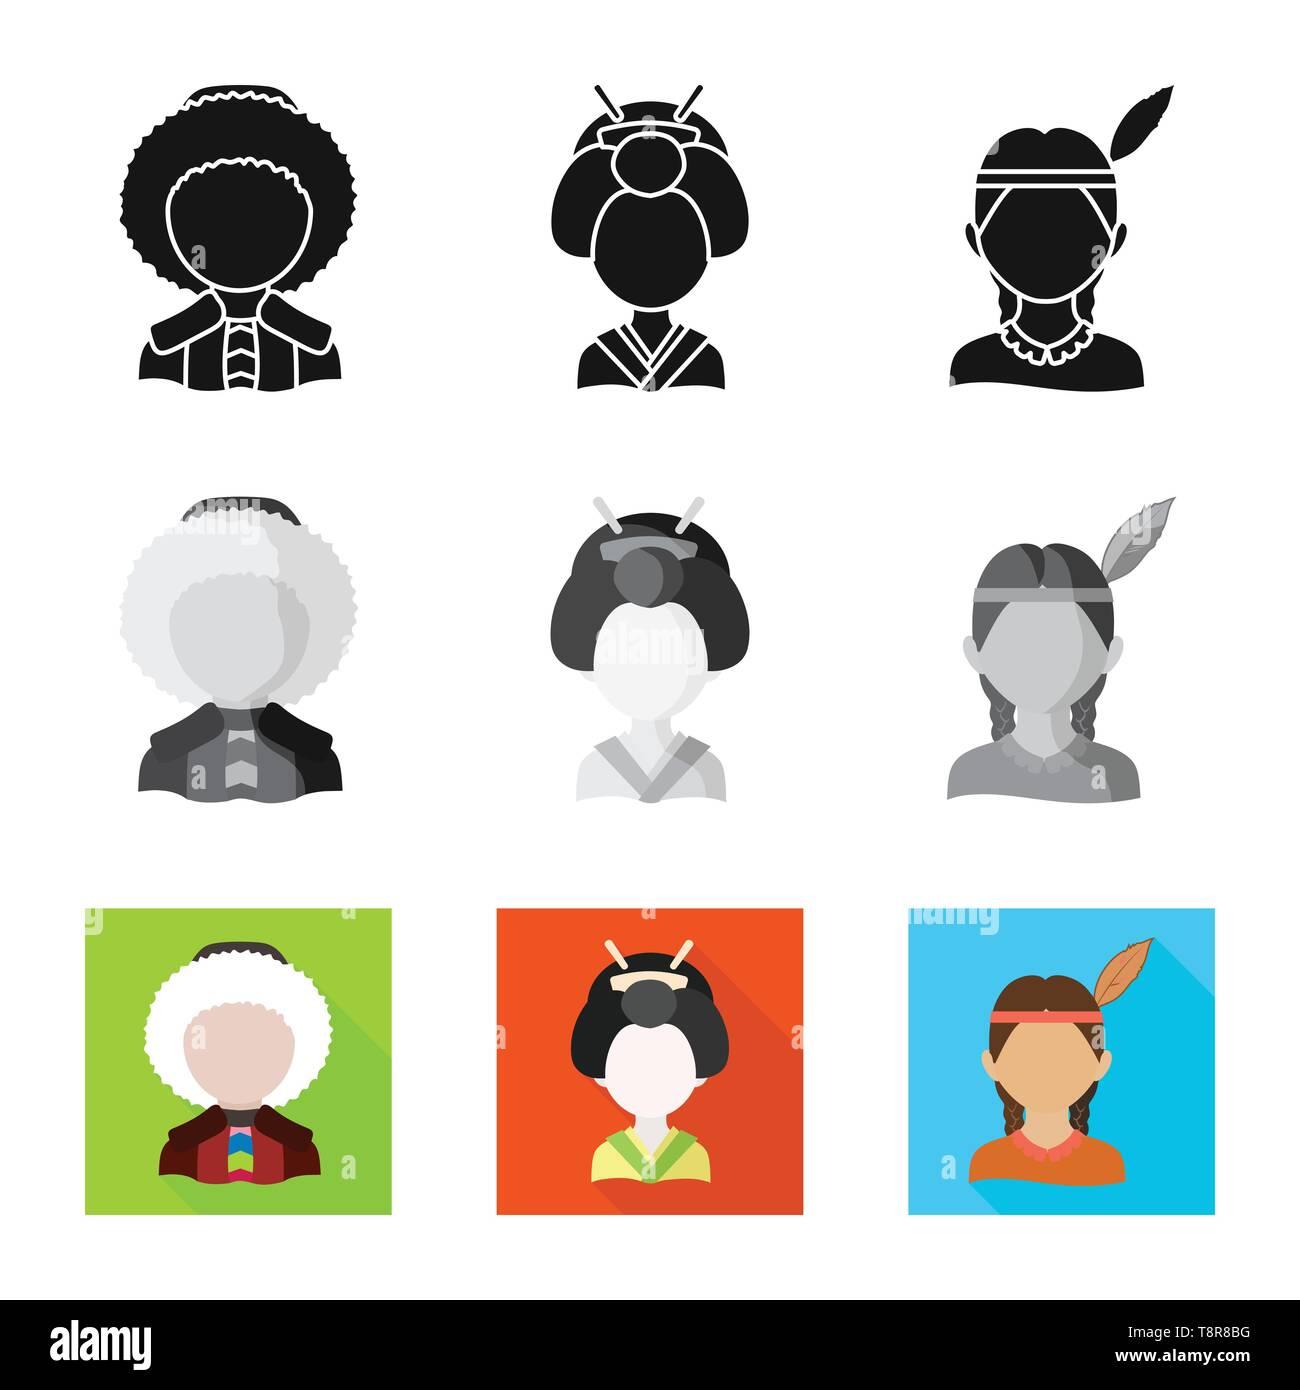 Vector illustration of imitator and resident sign. Collection of imitator and culture stock vector illustration. - Stock Image